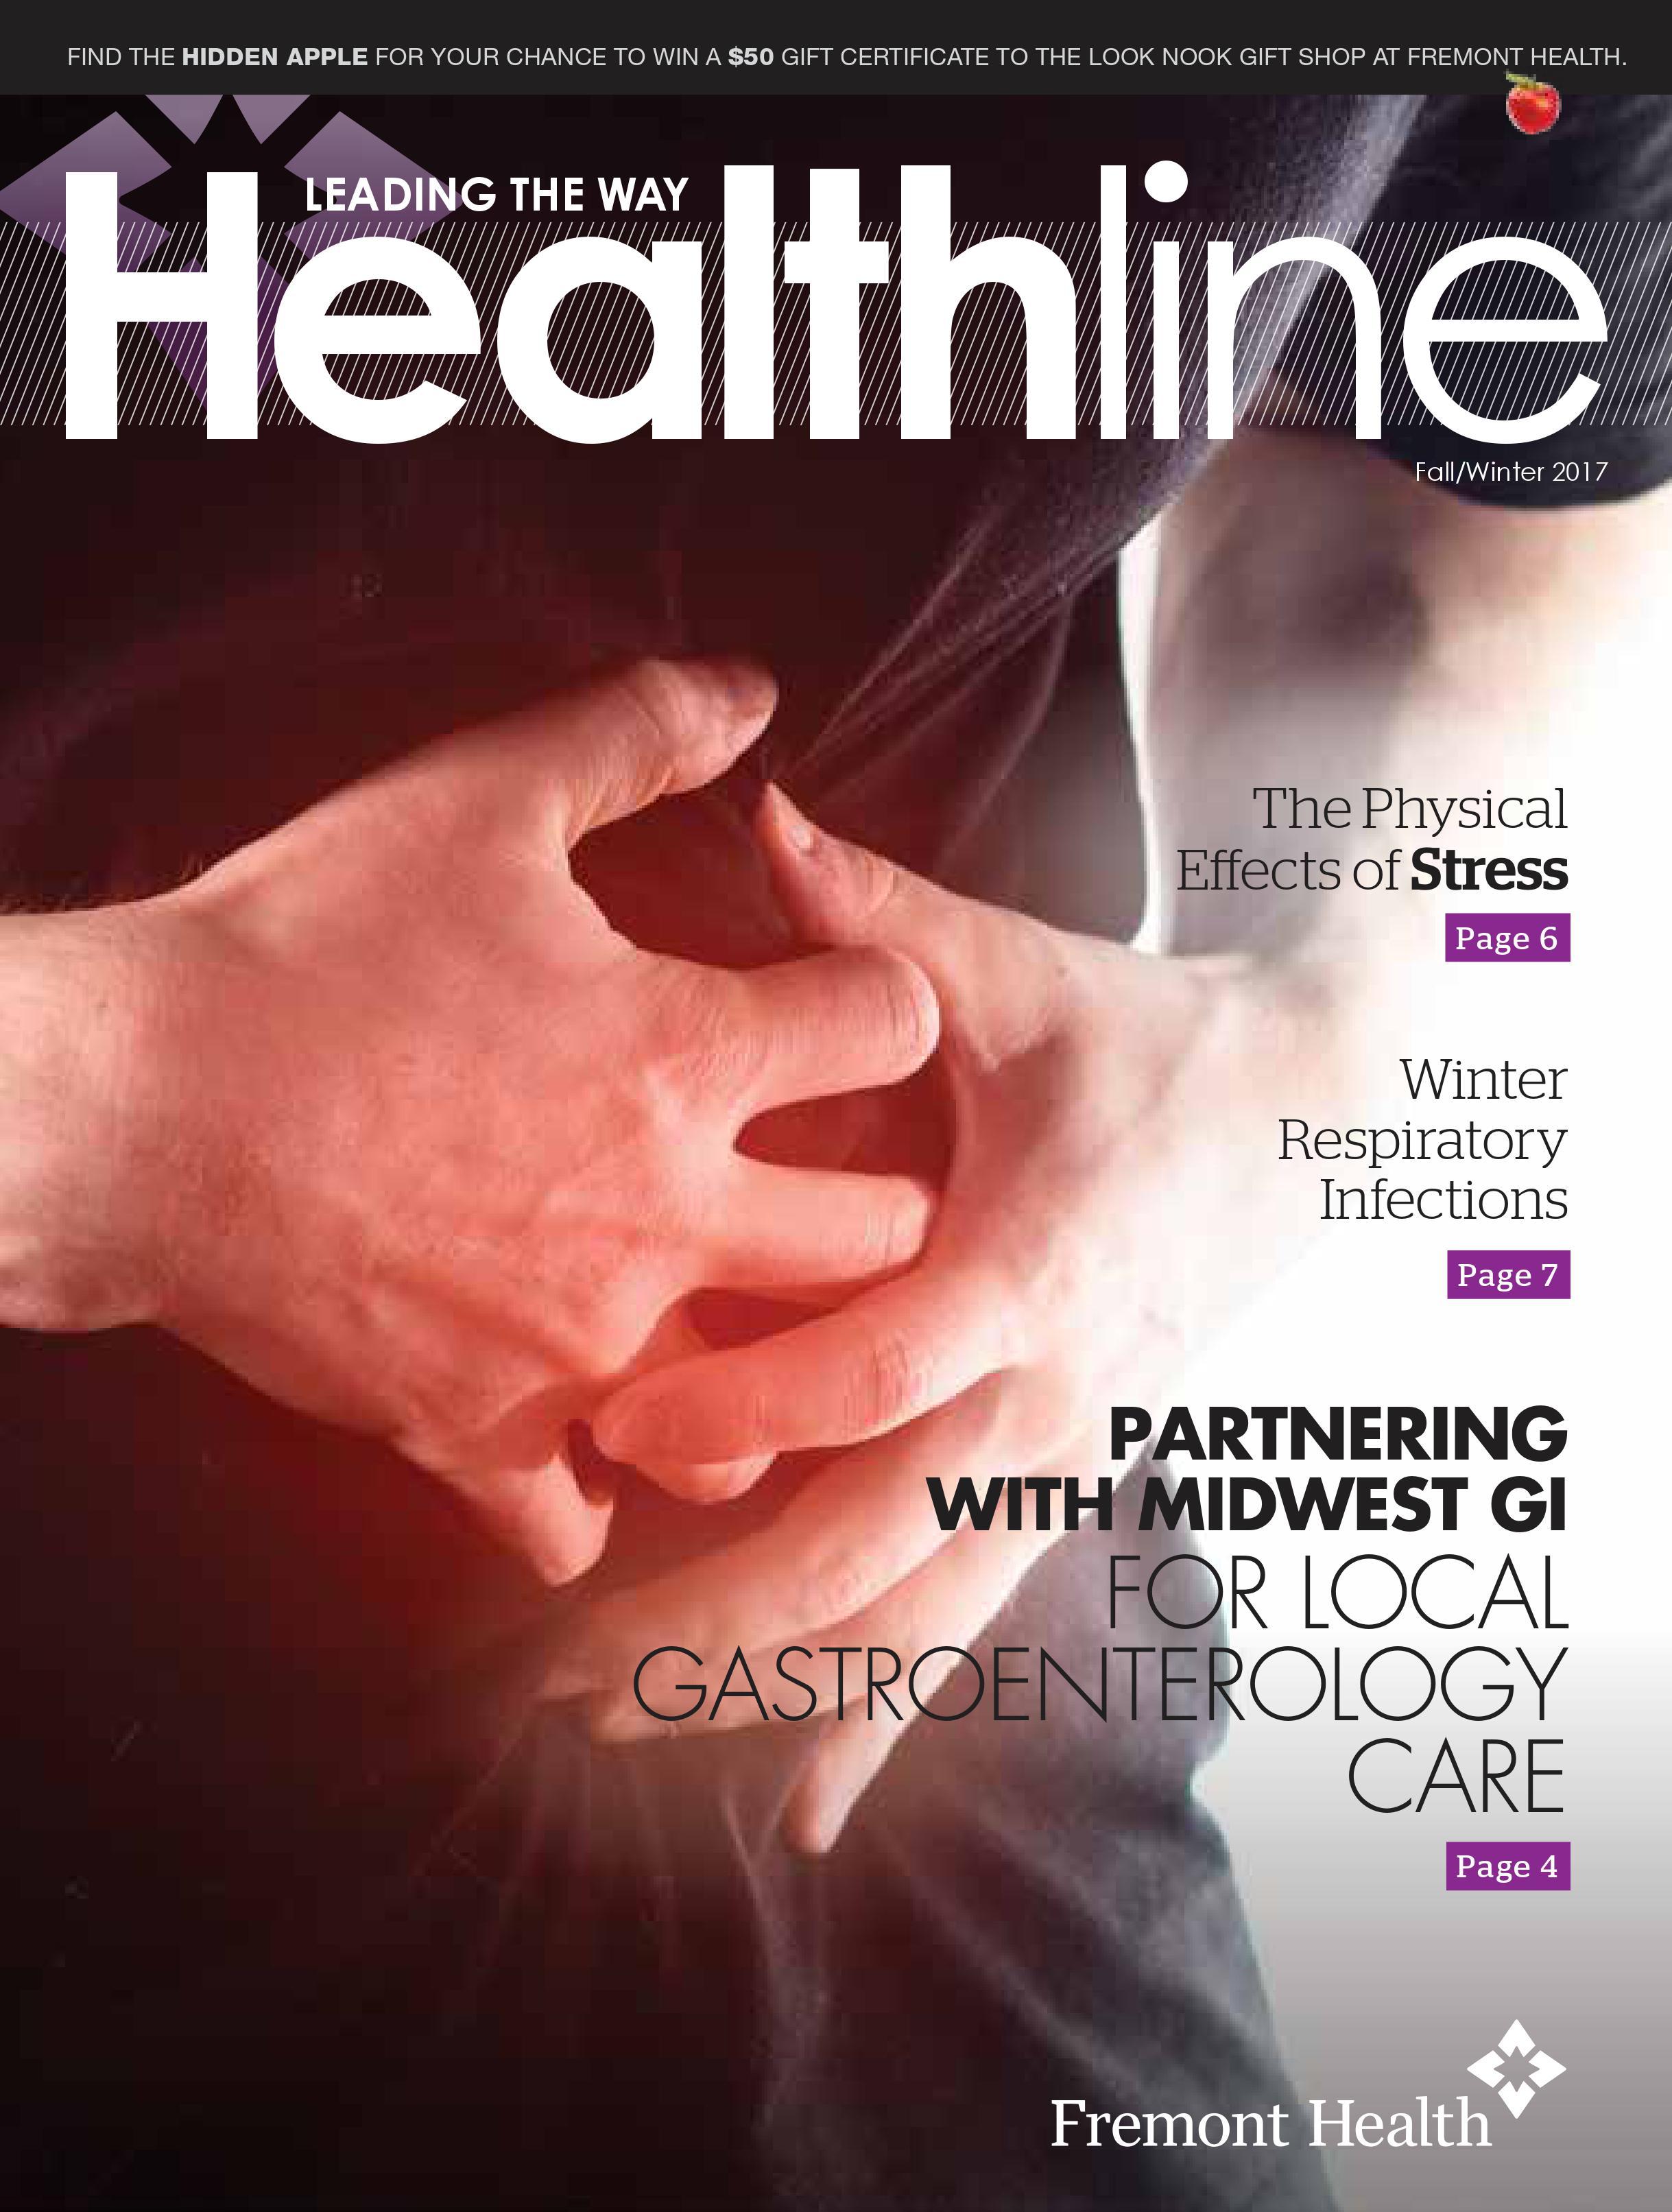 Healthline Fall/Winter 2017